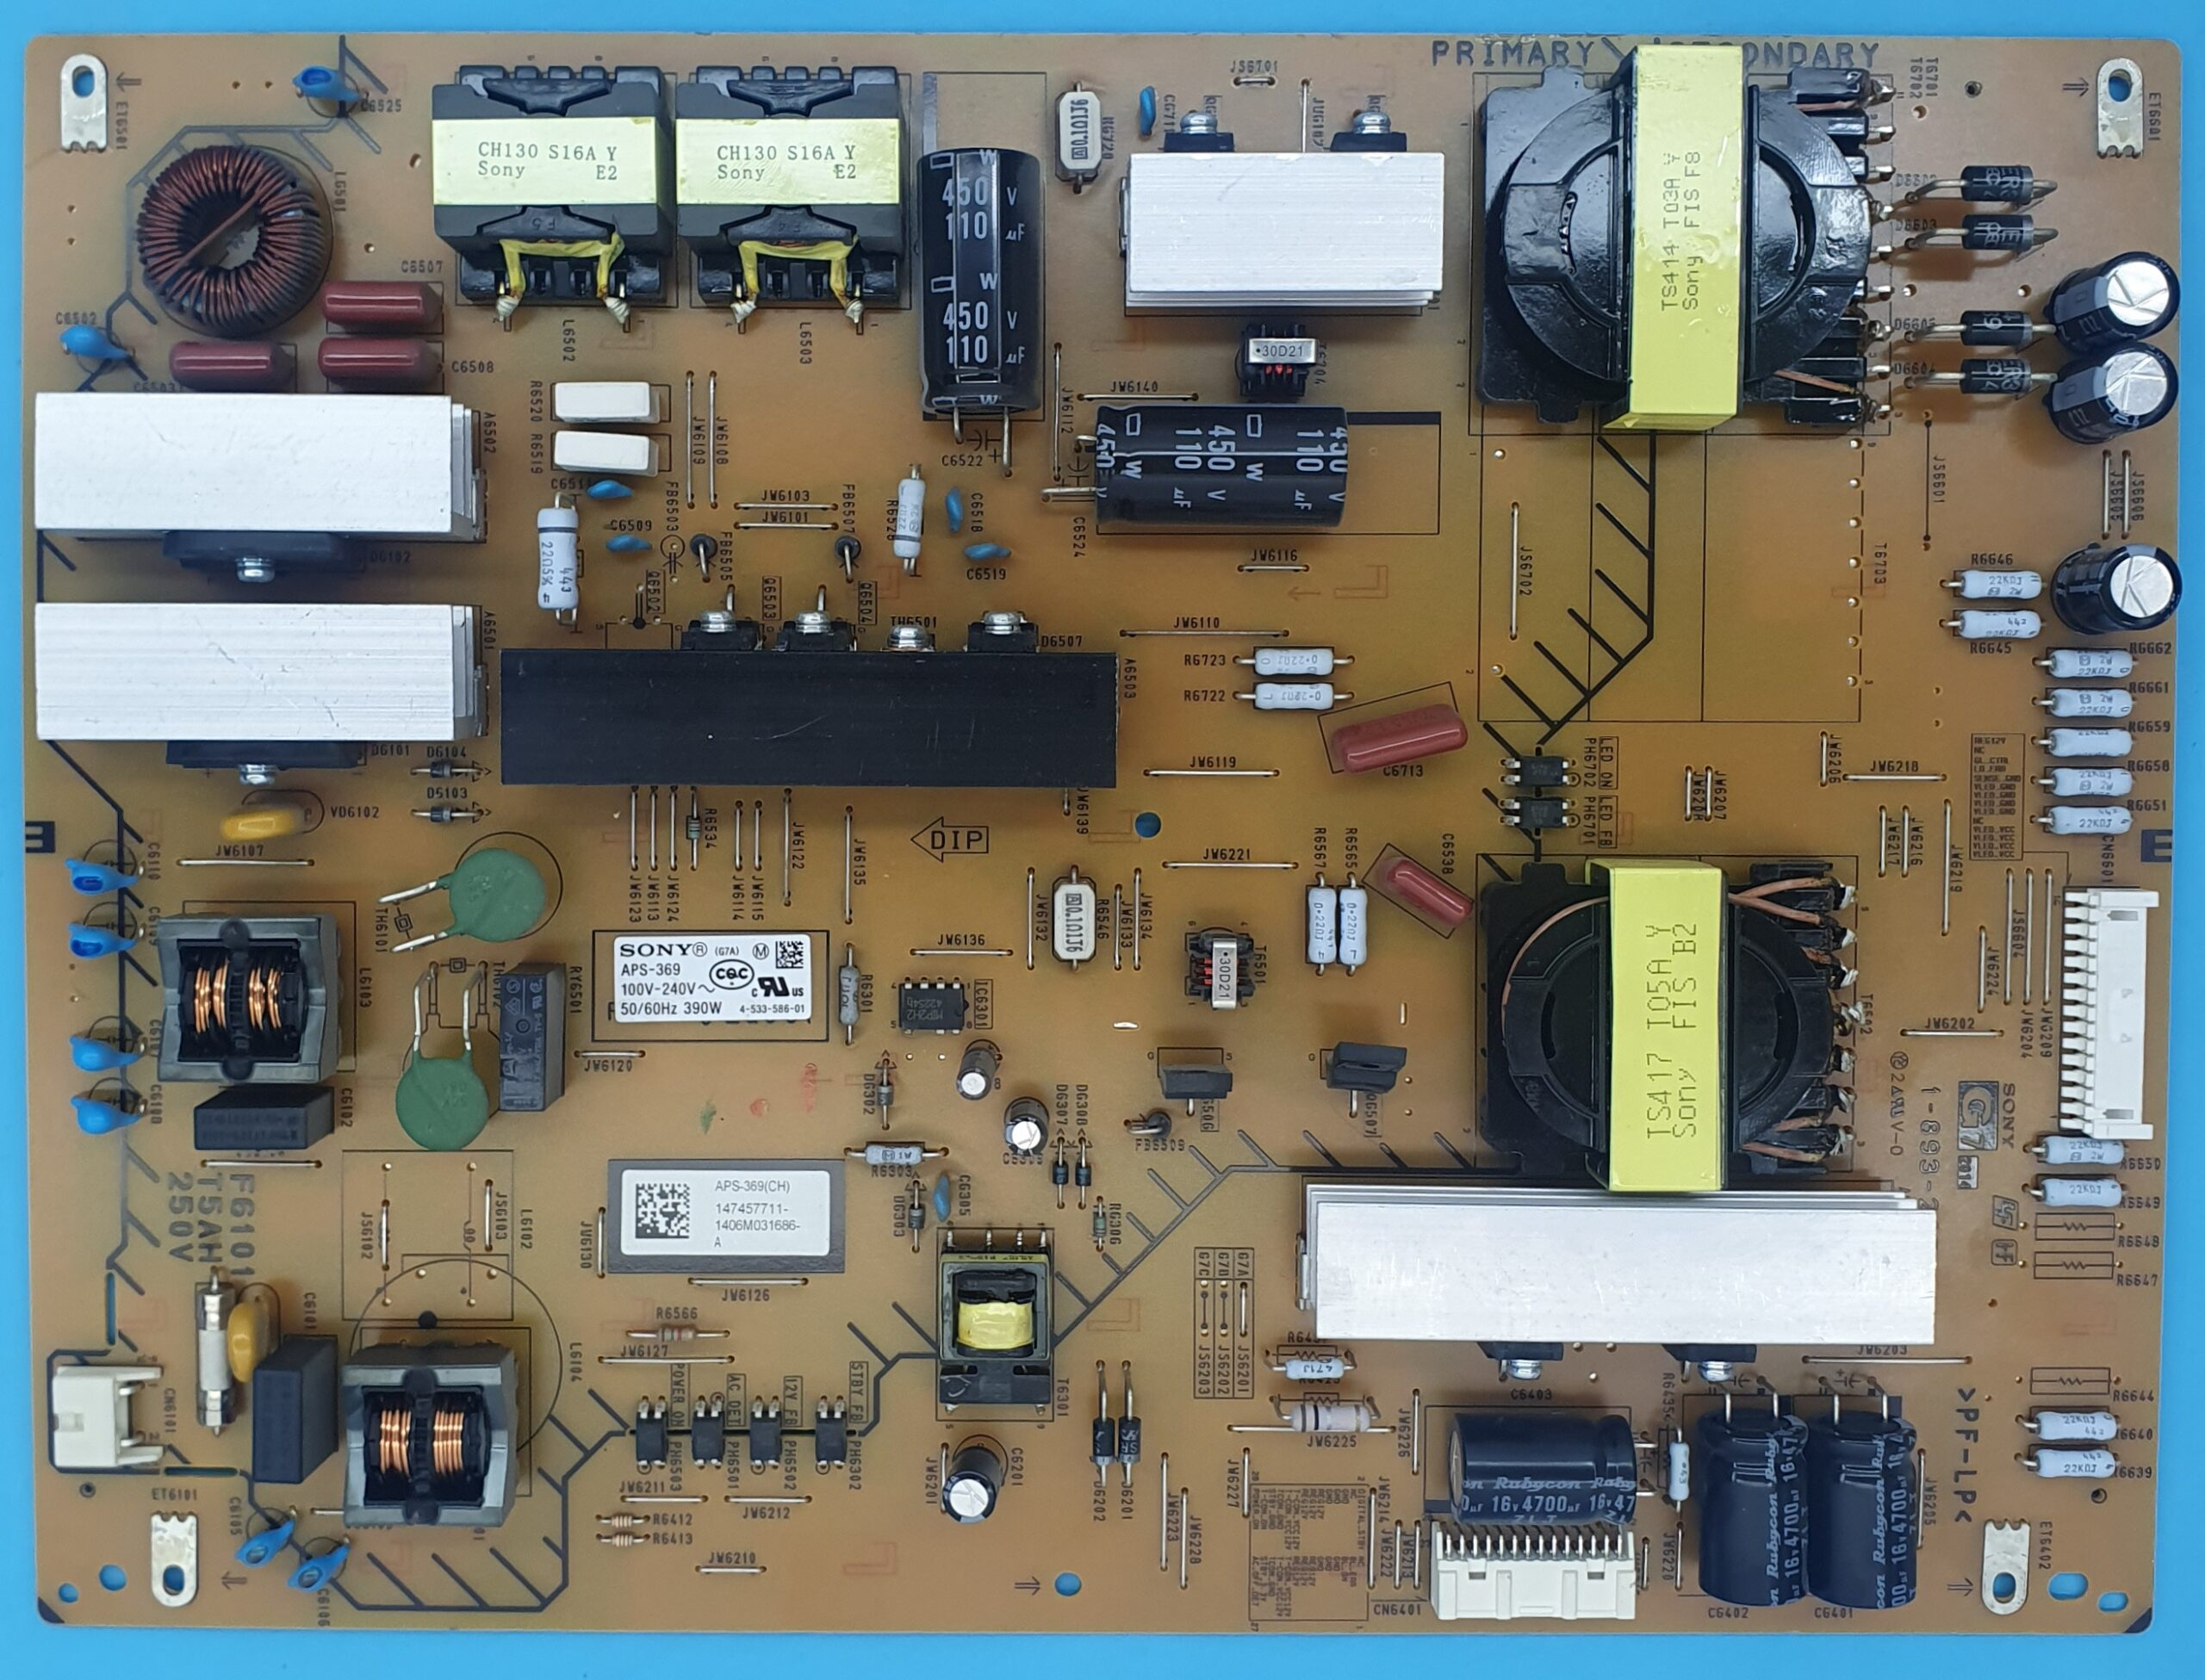 1-893-297-11 Sony Power (KDV DAHİL = 300 TL)